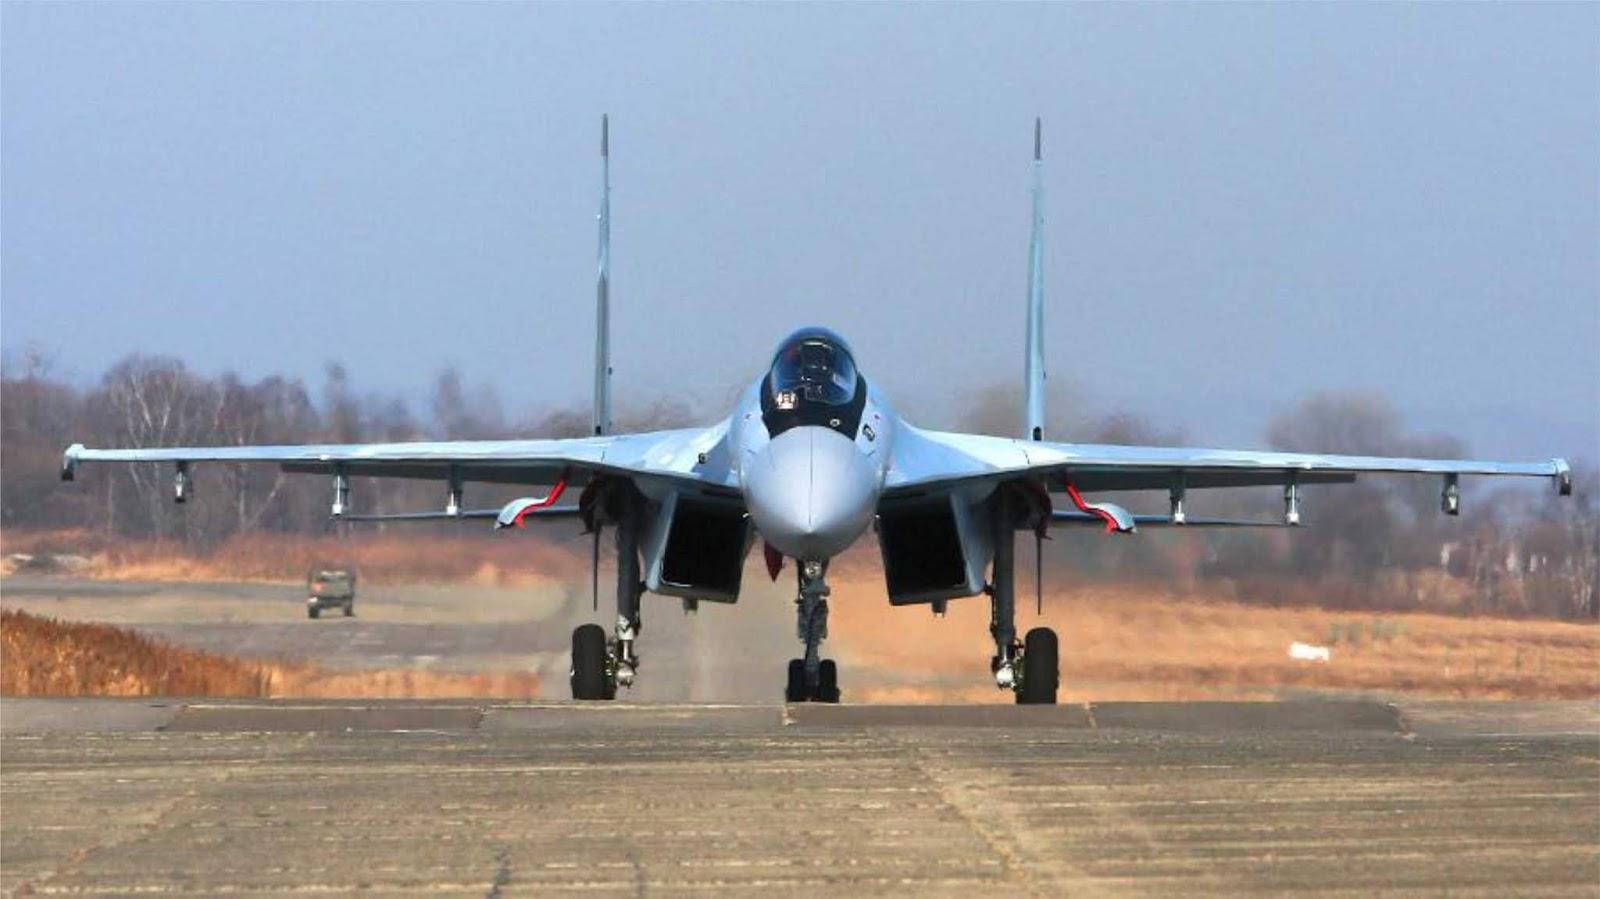 Dubes Indonesia menjelaskan tentang penundaan dalam pelaksanaan kontrak Su-35